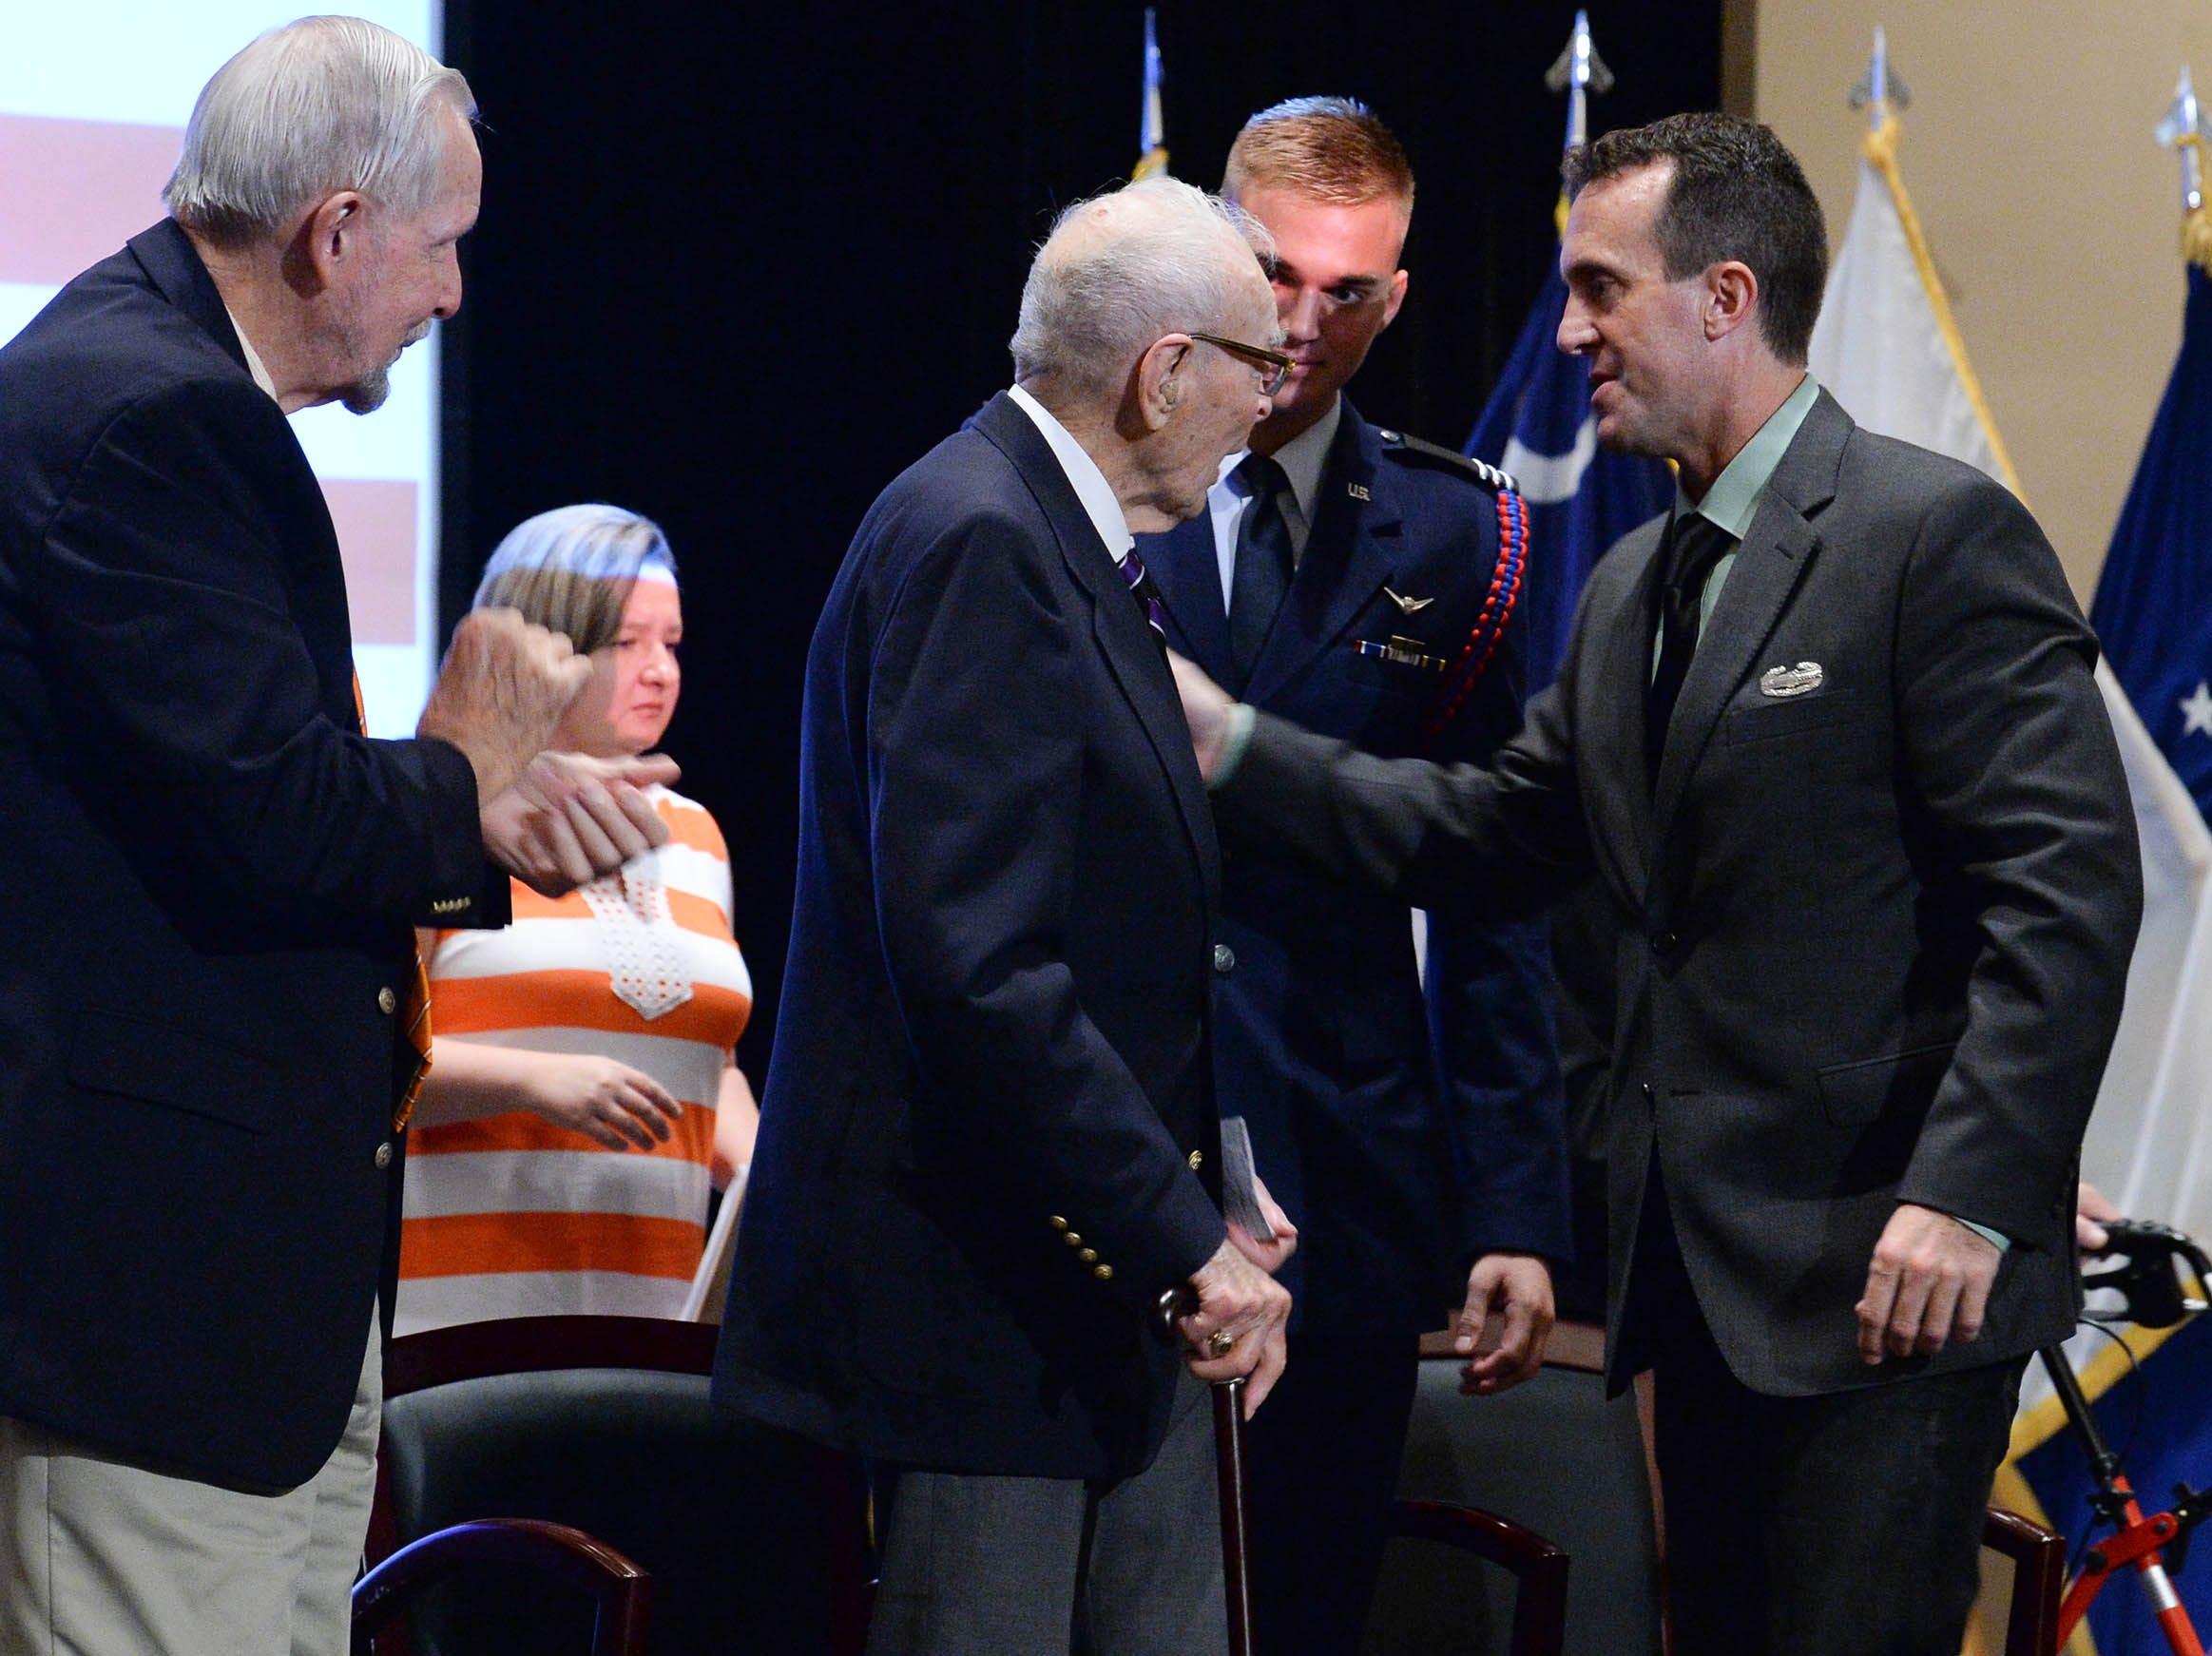 Living Prisoner of War 1st Lt. Bill Funchess, middle, is greeted by Ken Scar, right, near Col. Bill Austin spoke in Tillman Hall at Clemson University  on Thursday.